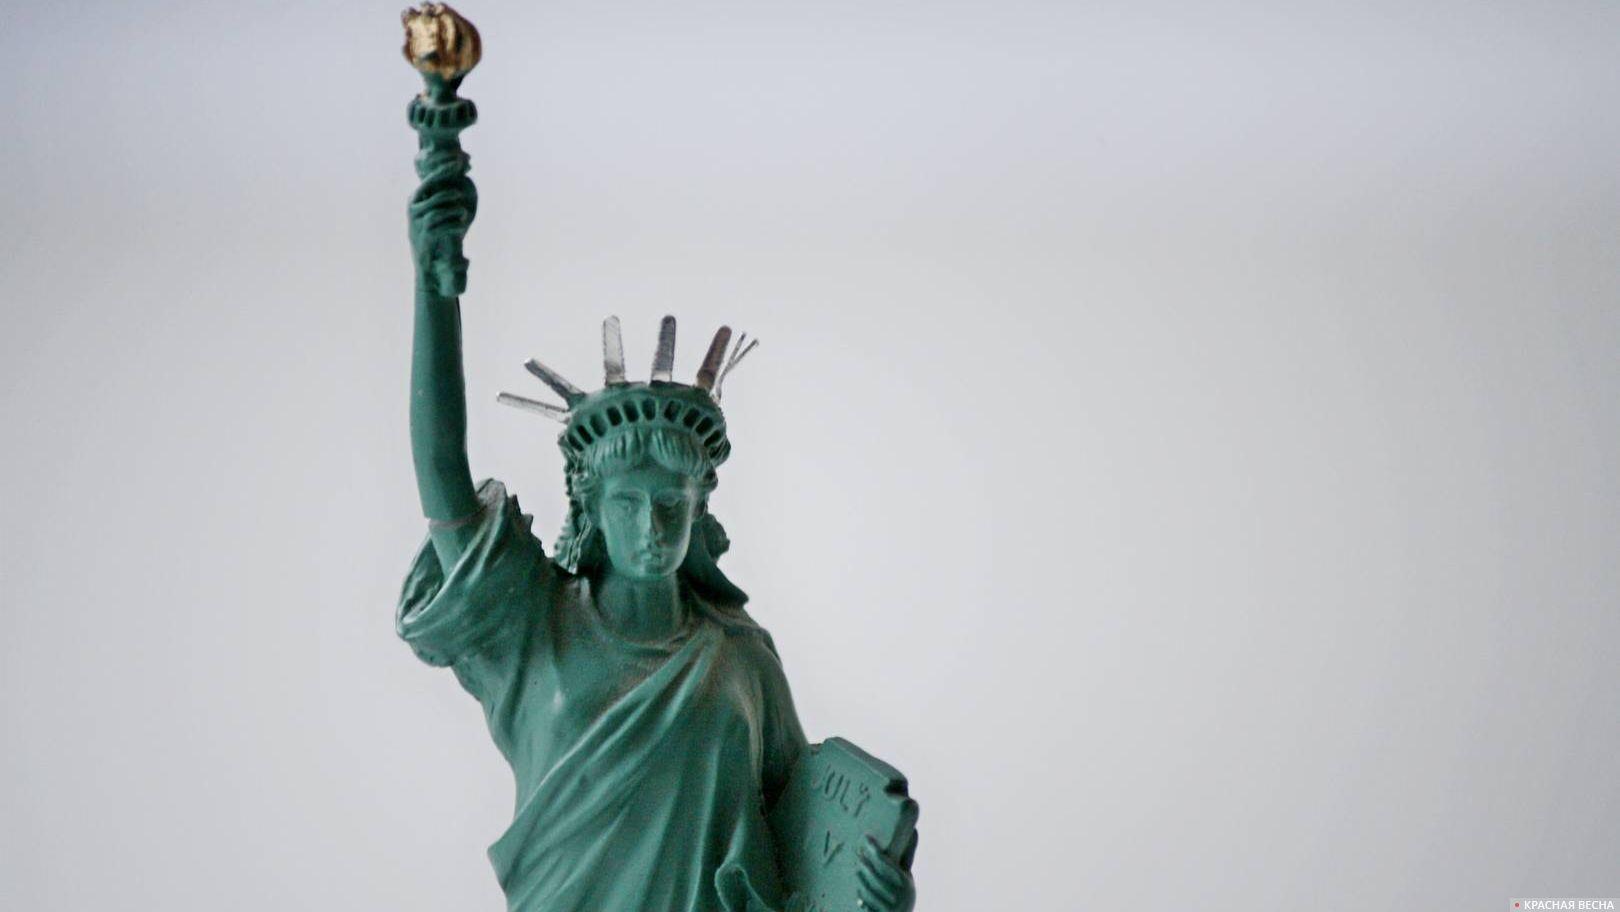 Фигурка Статуи Свободы